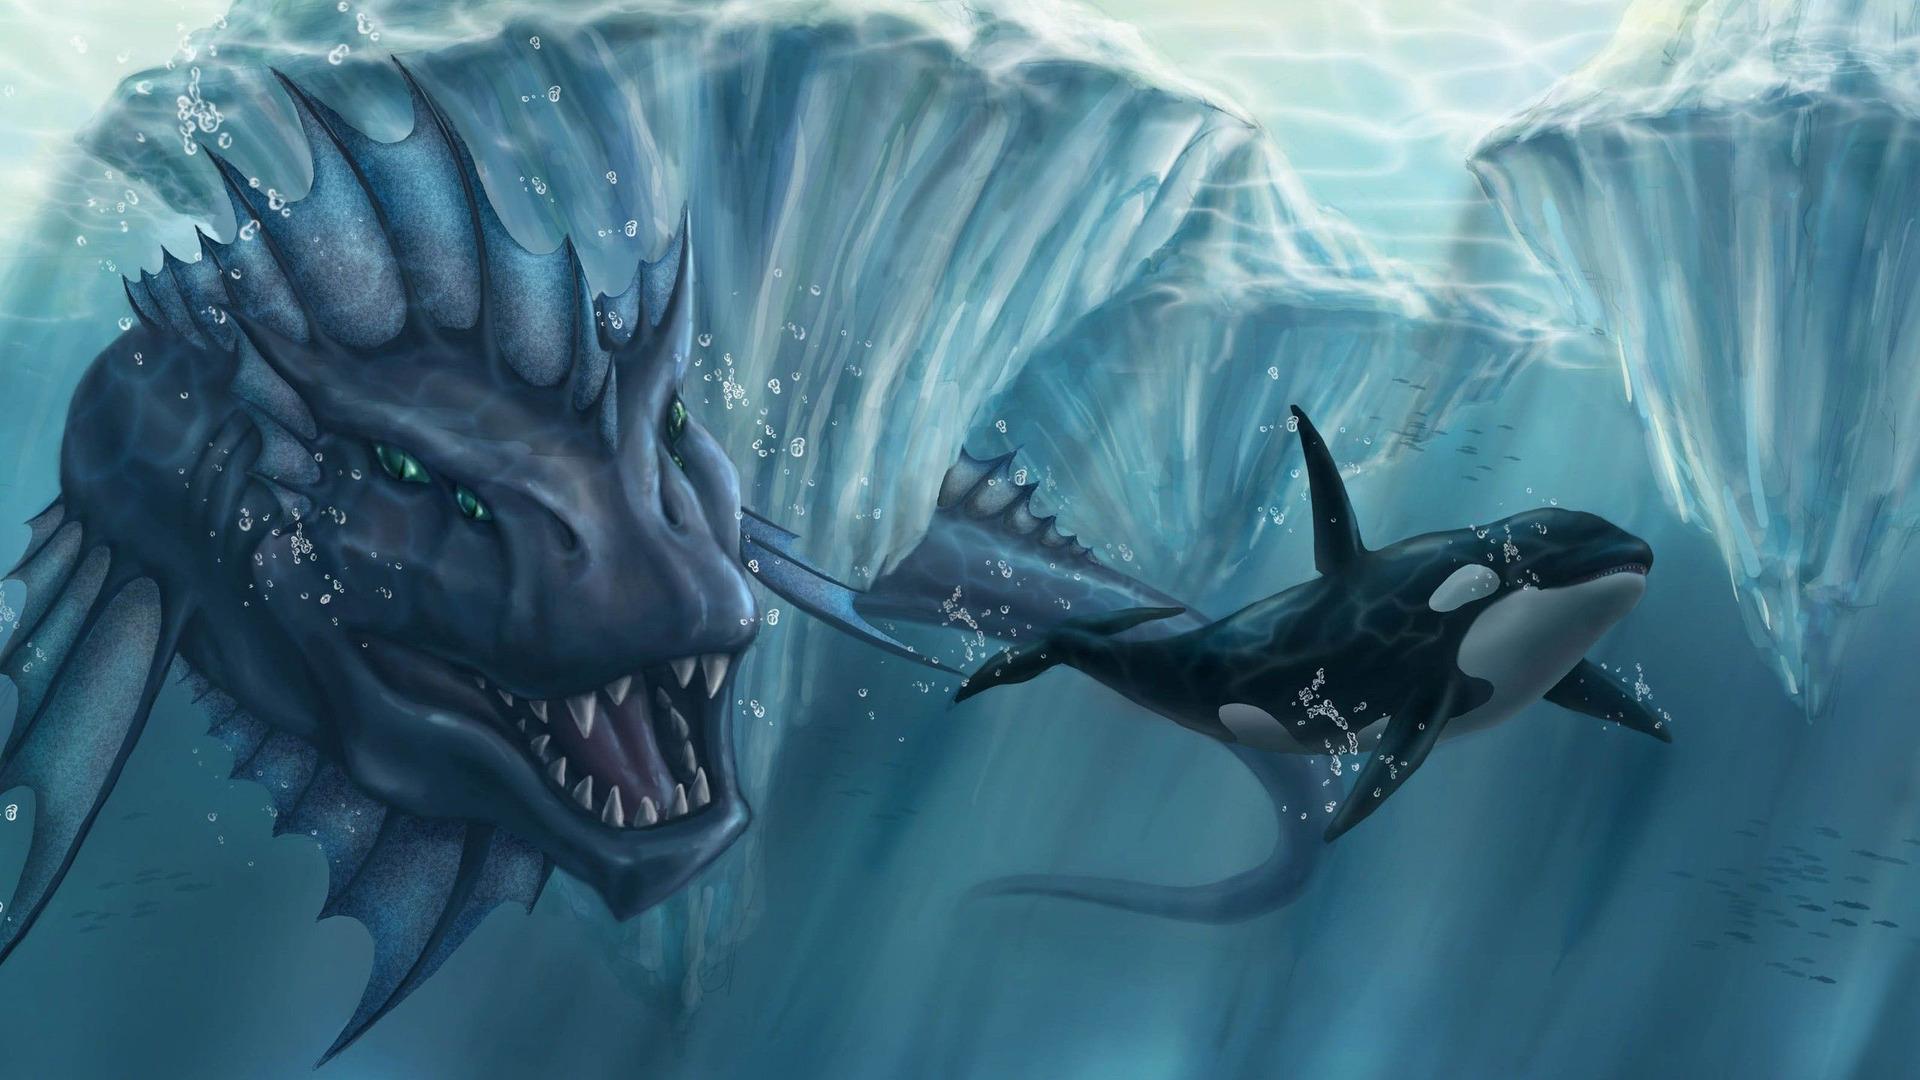 Sea monster chasing the killer whale Wallpaper 7526 1920x1080